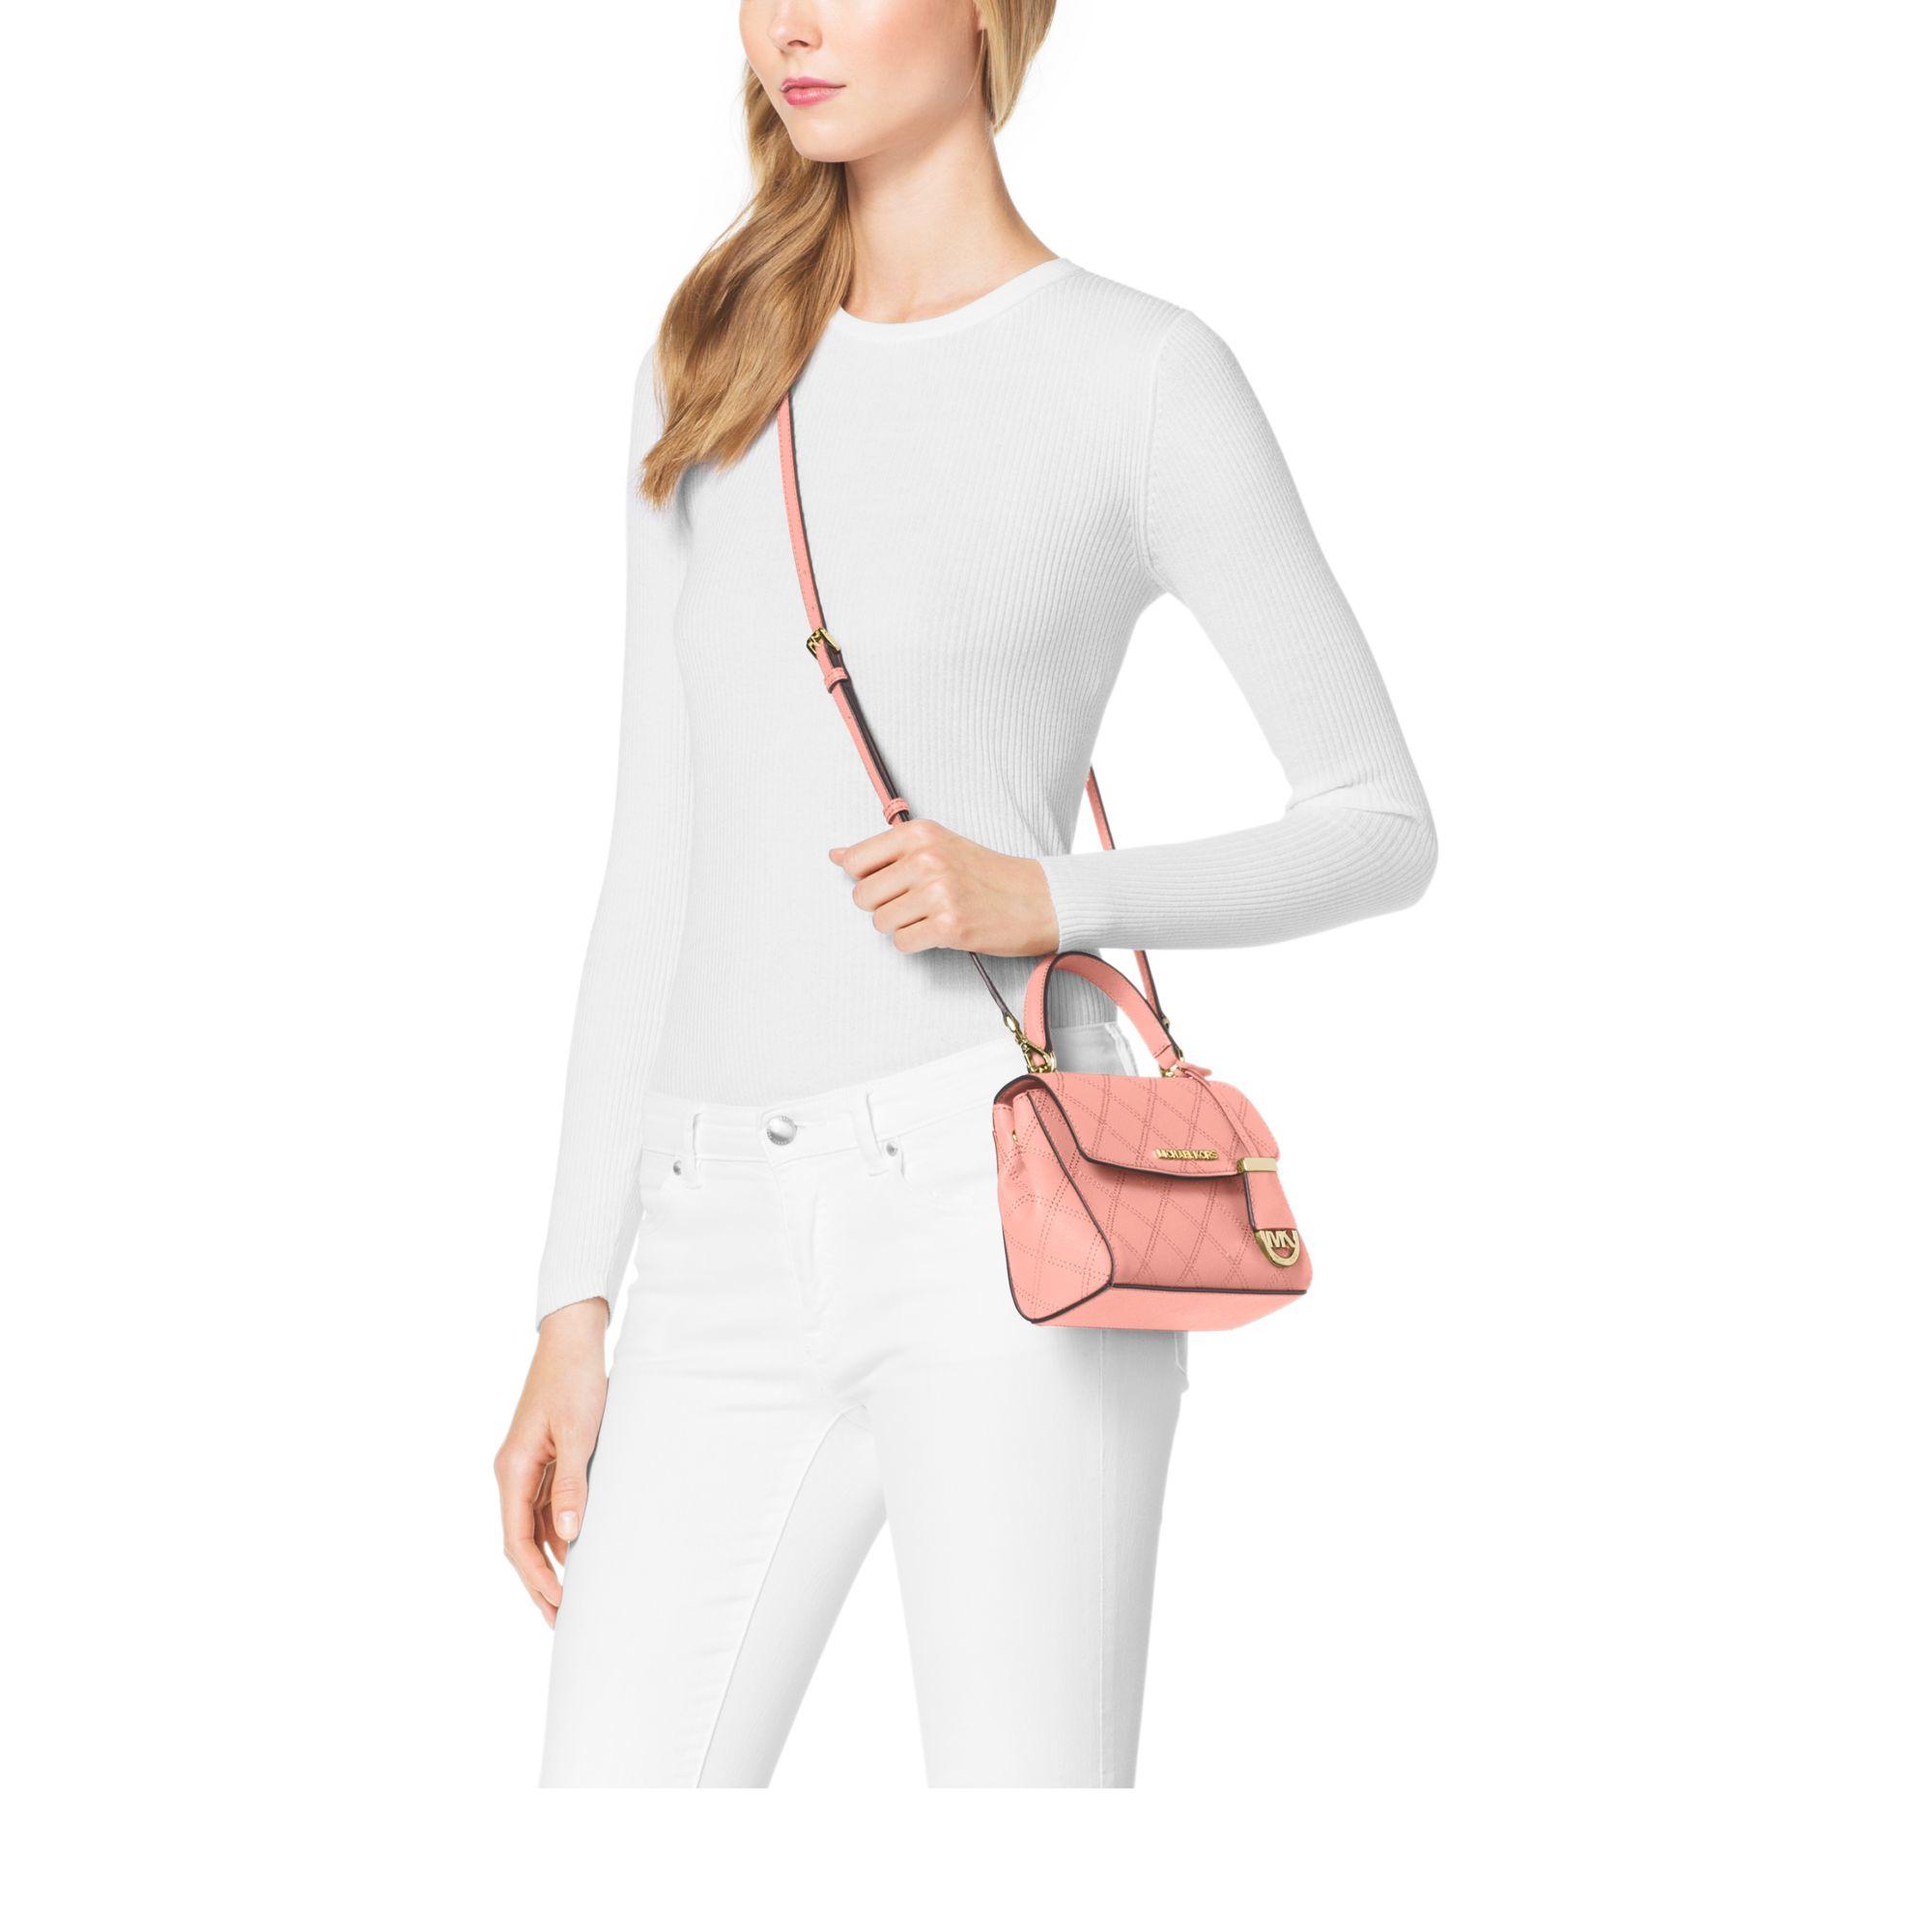 566dc594d809 germany lyst michael kors marlow small leather satchel in pink ebc9d bfe53;  store womens weekender bags womens michael kors . 5bd94 edb17